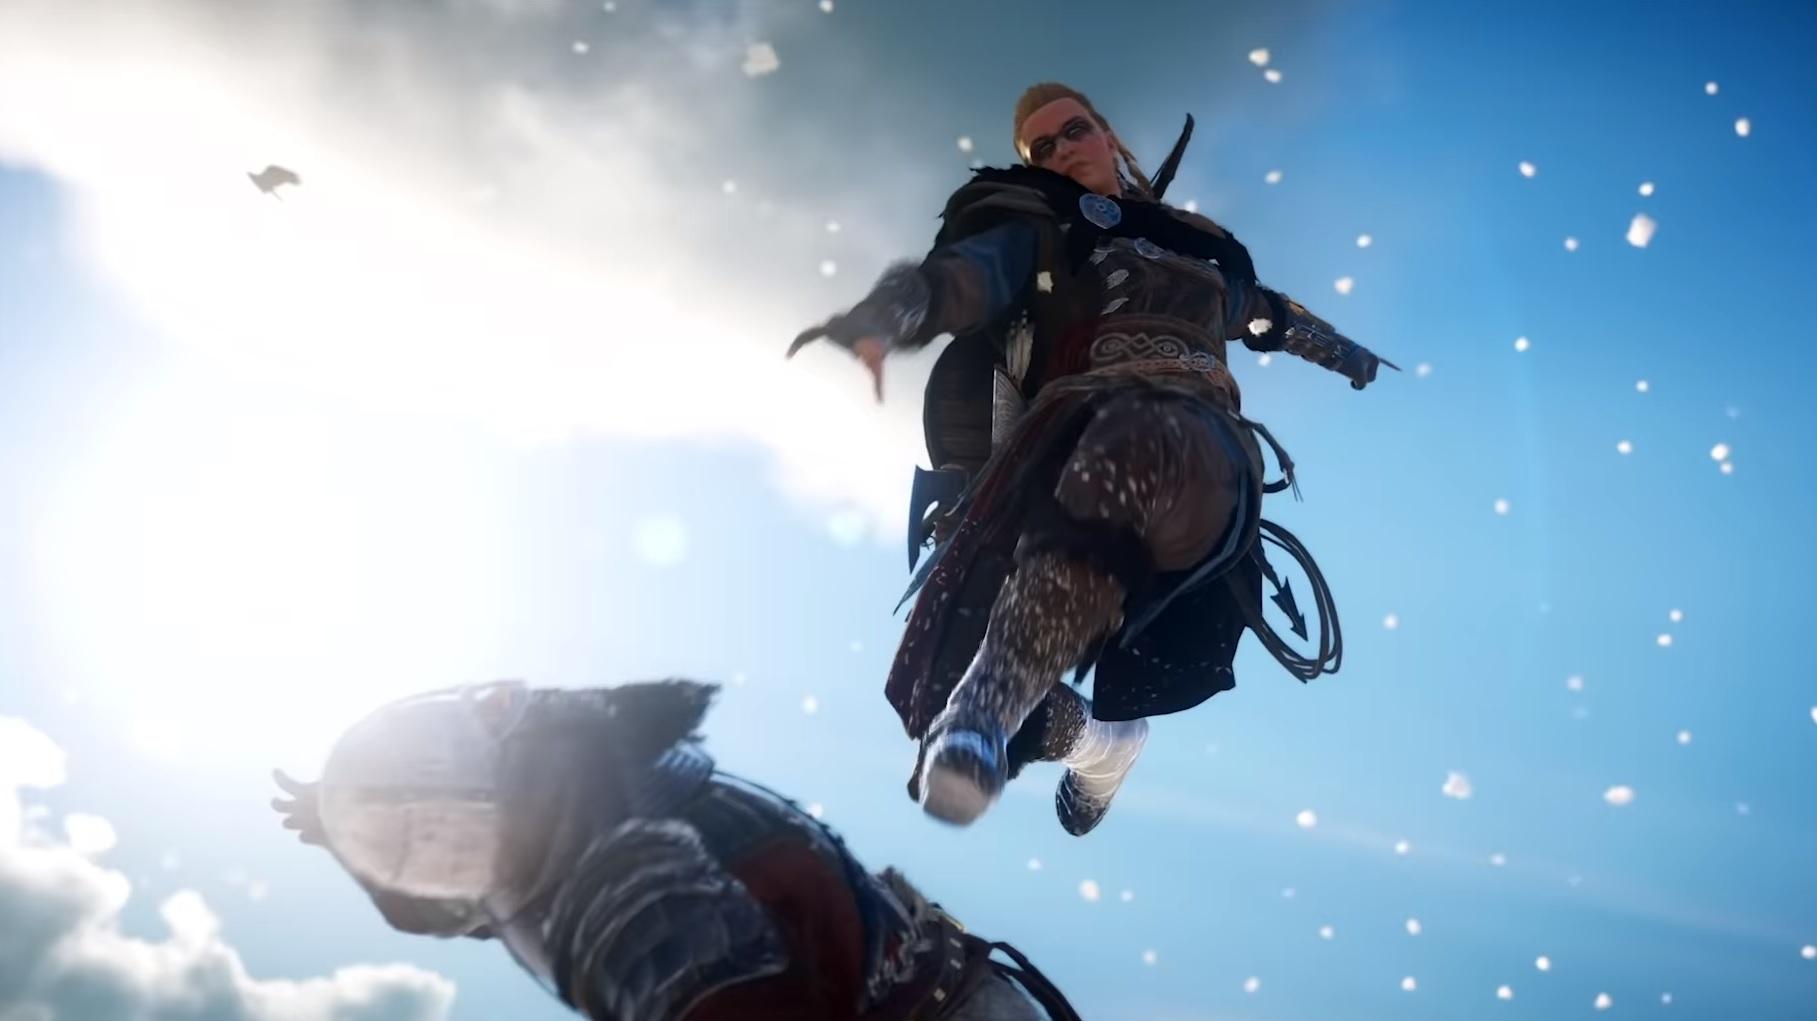 Assassin S Creed Valhalla Has Mortal Kombat Style X Ray Attacks